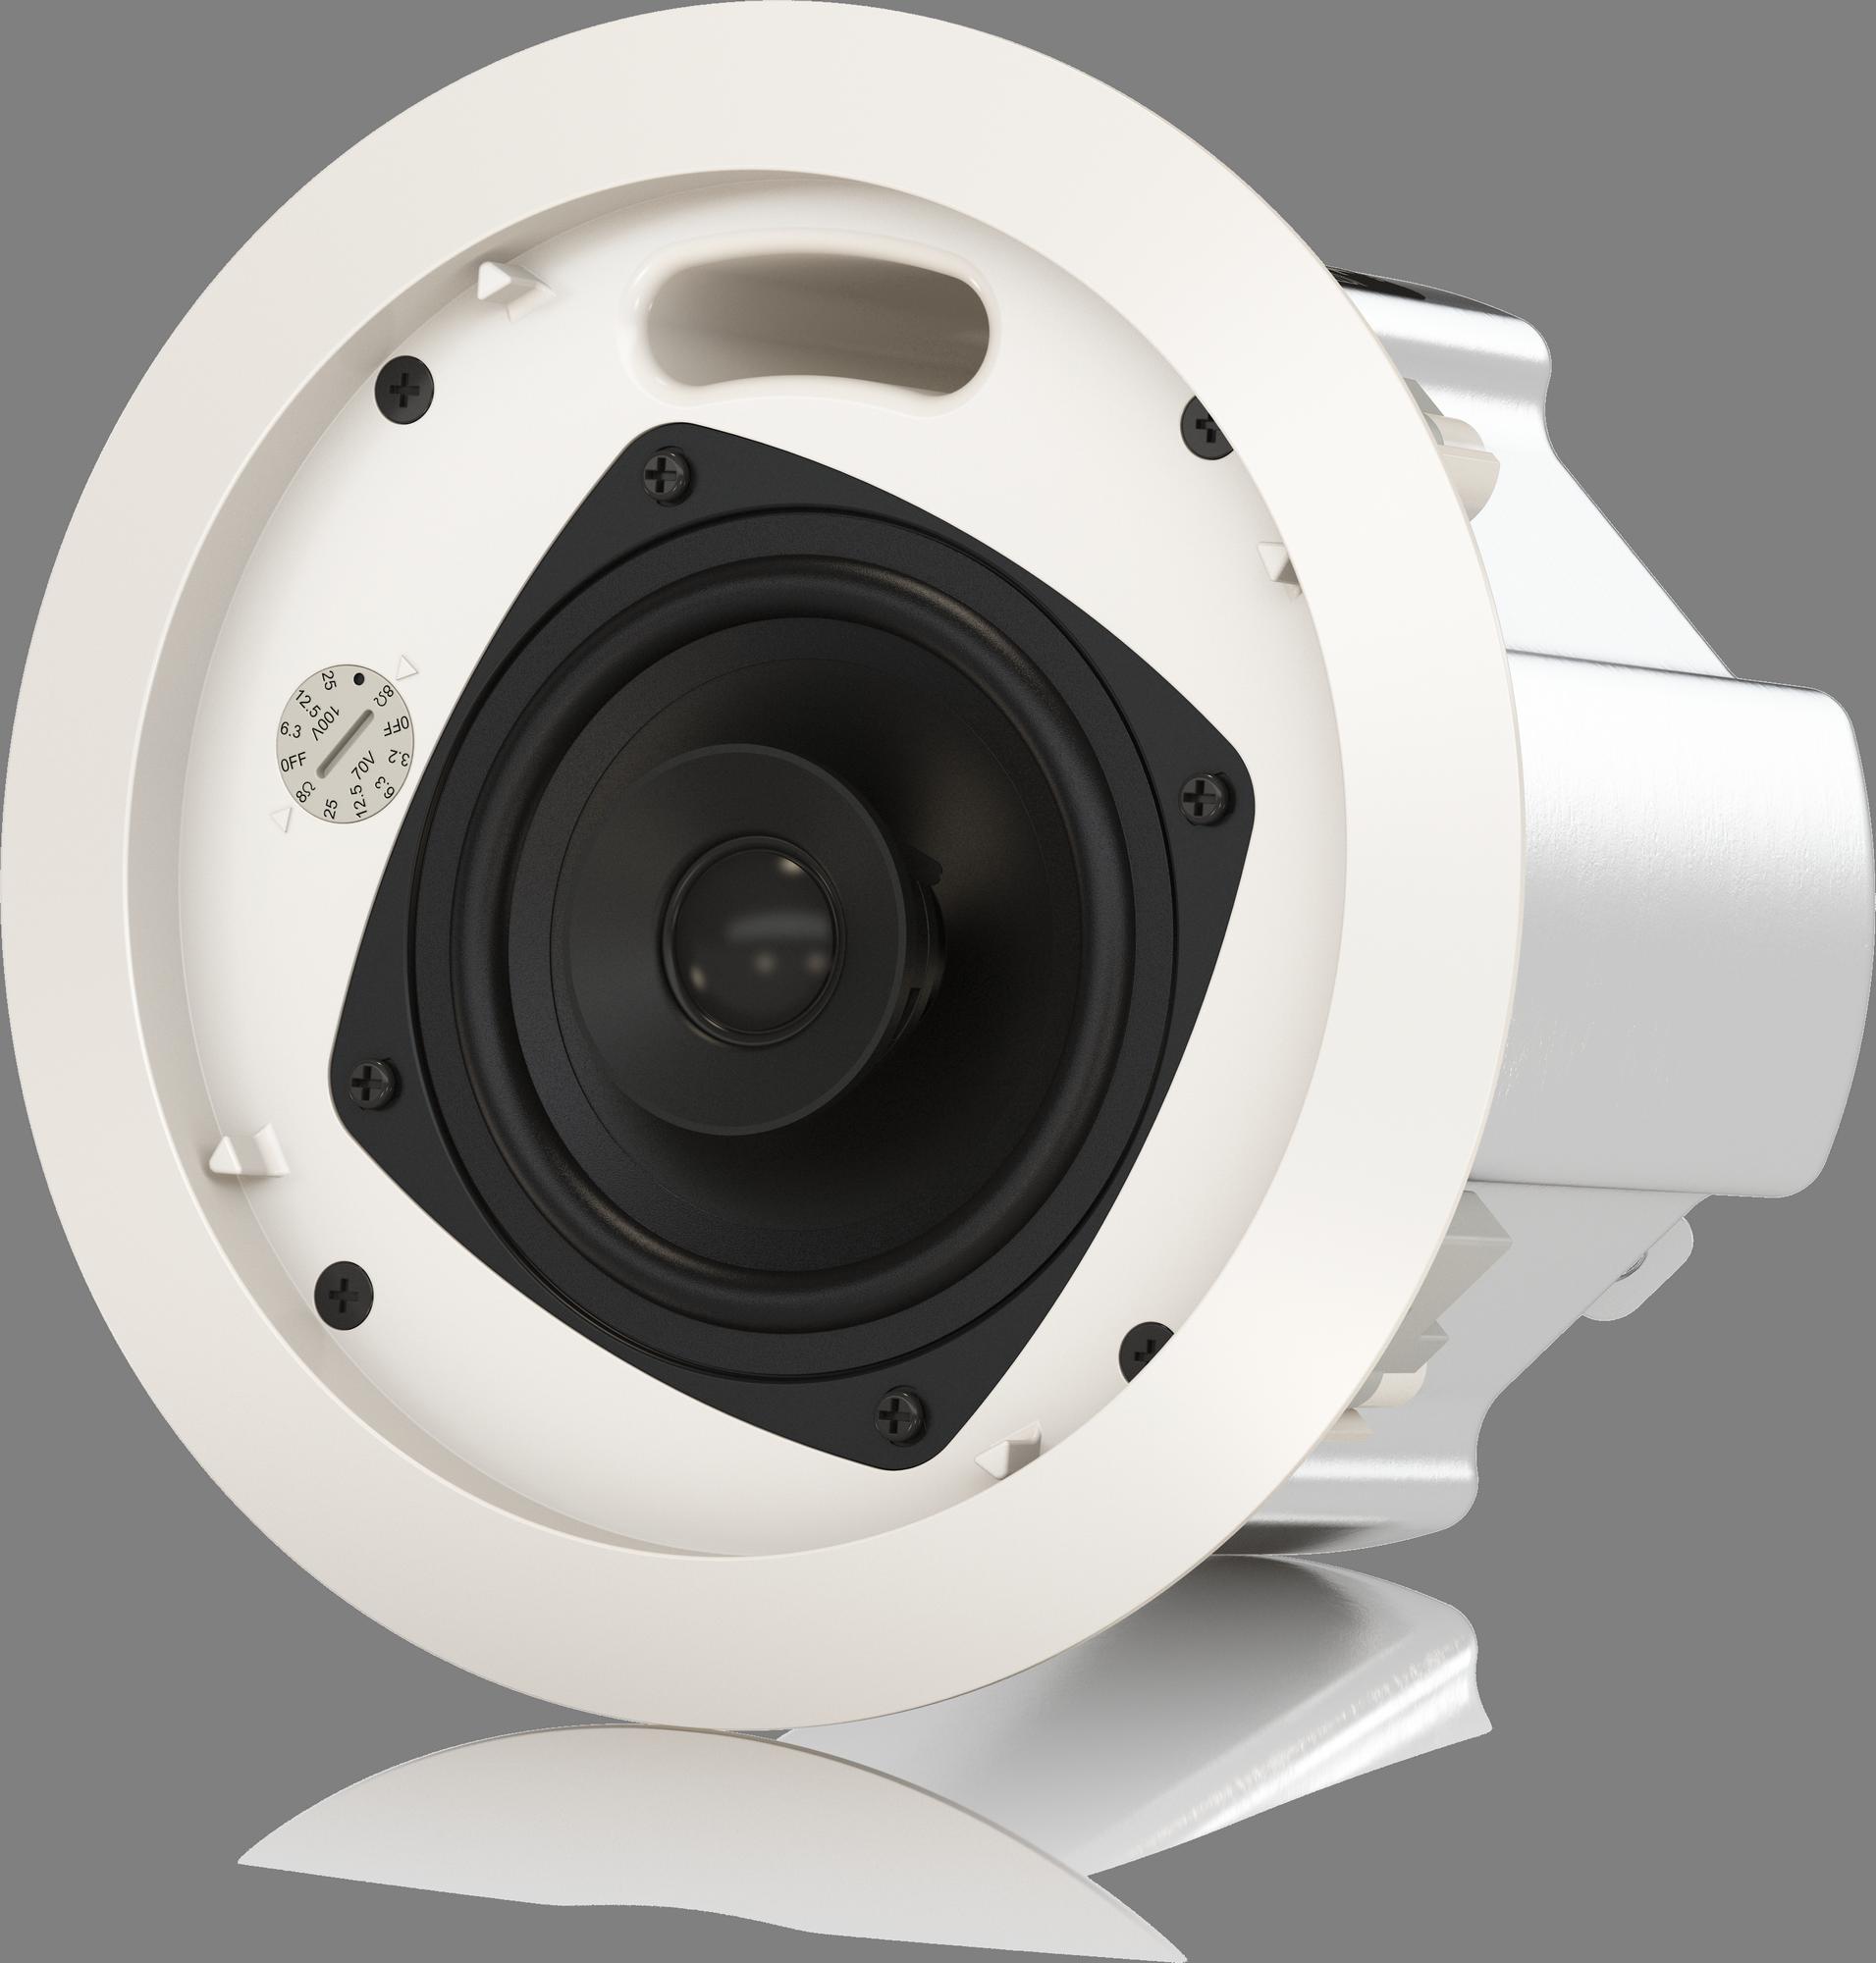 Tannoy  CVS 401 - Haut parleur d'installation